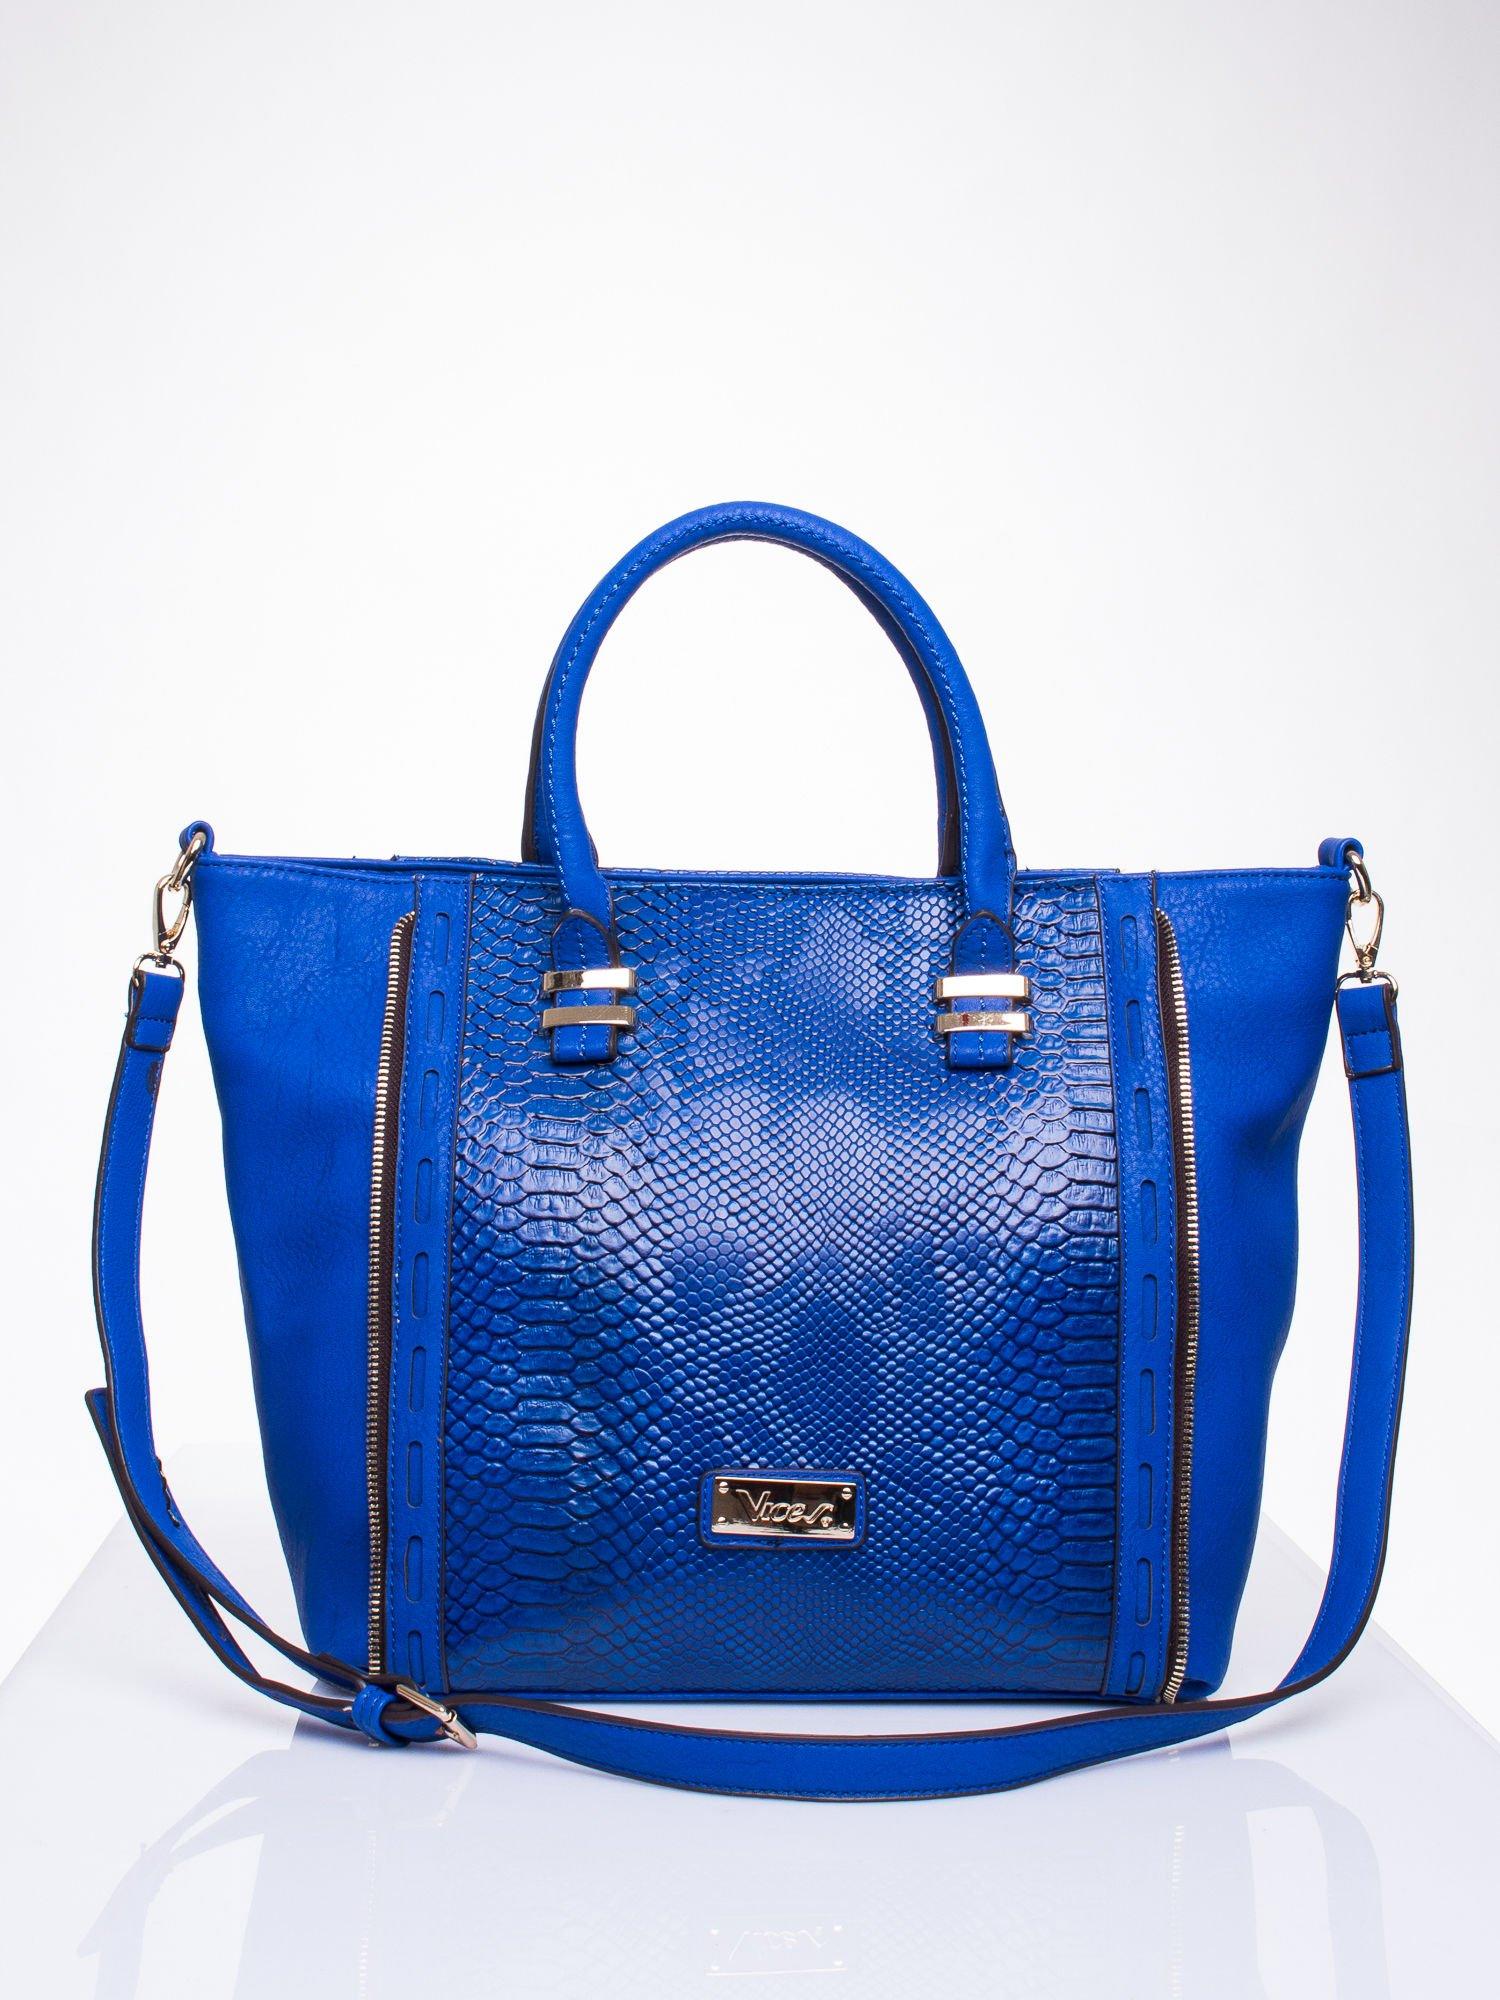 Niebieska torba shopper bag z wzorem skóry węża                                  zdj.                                  1